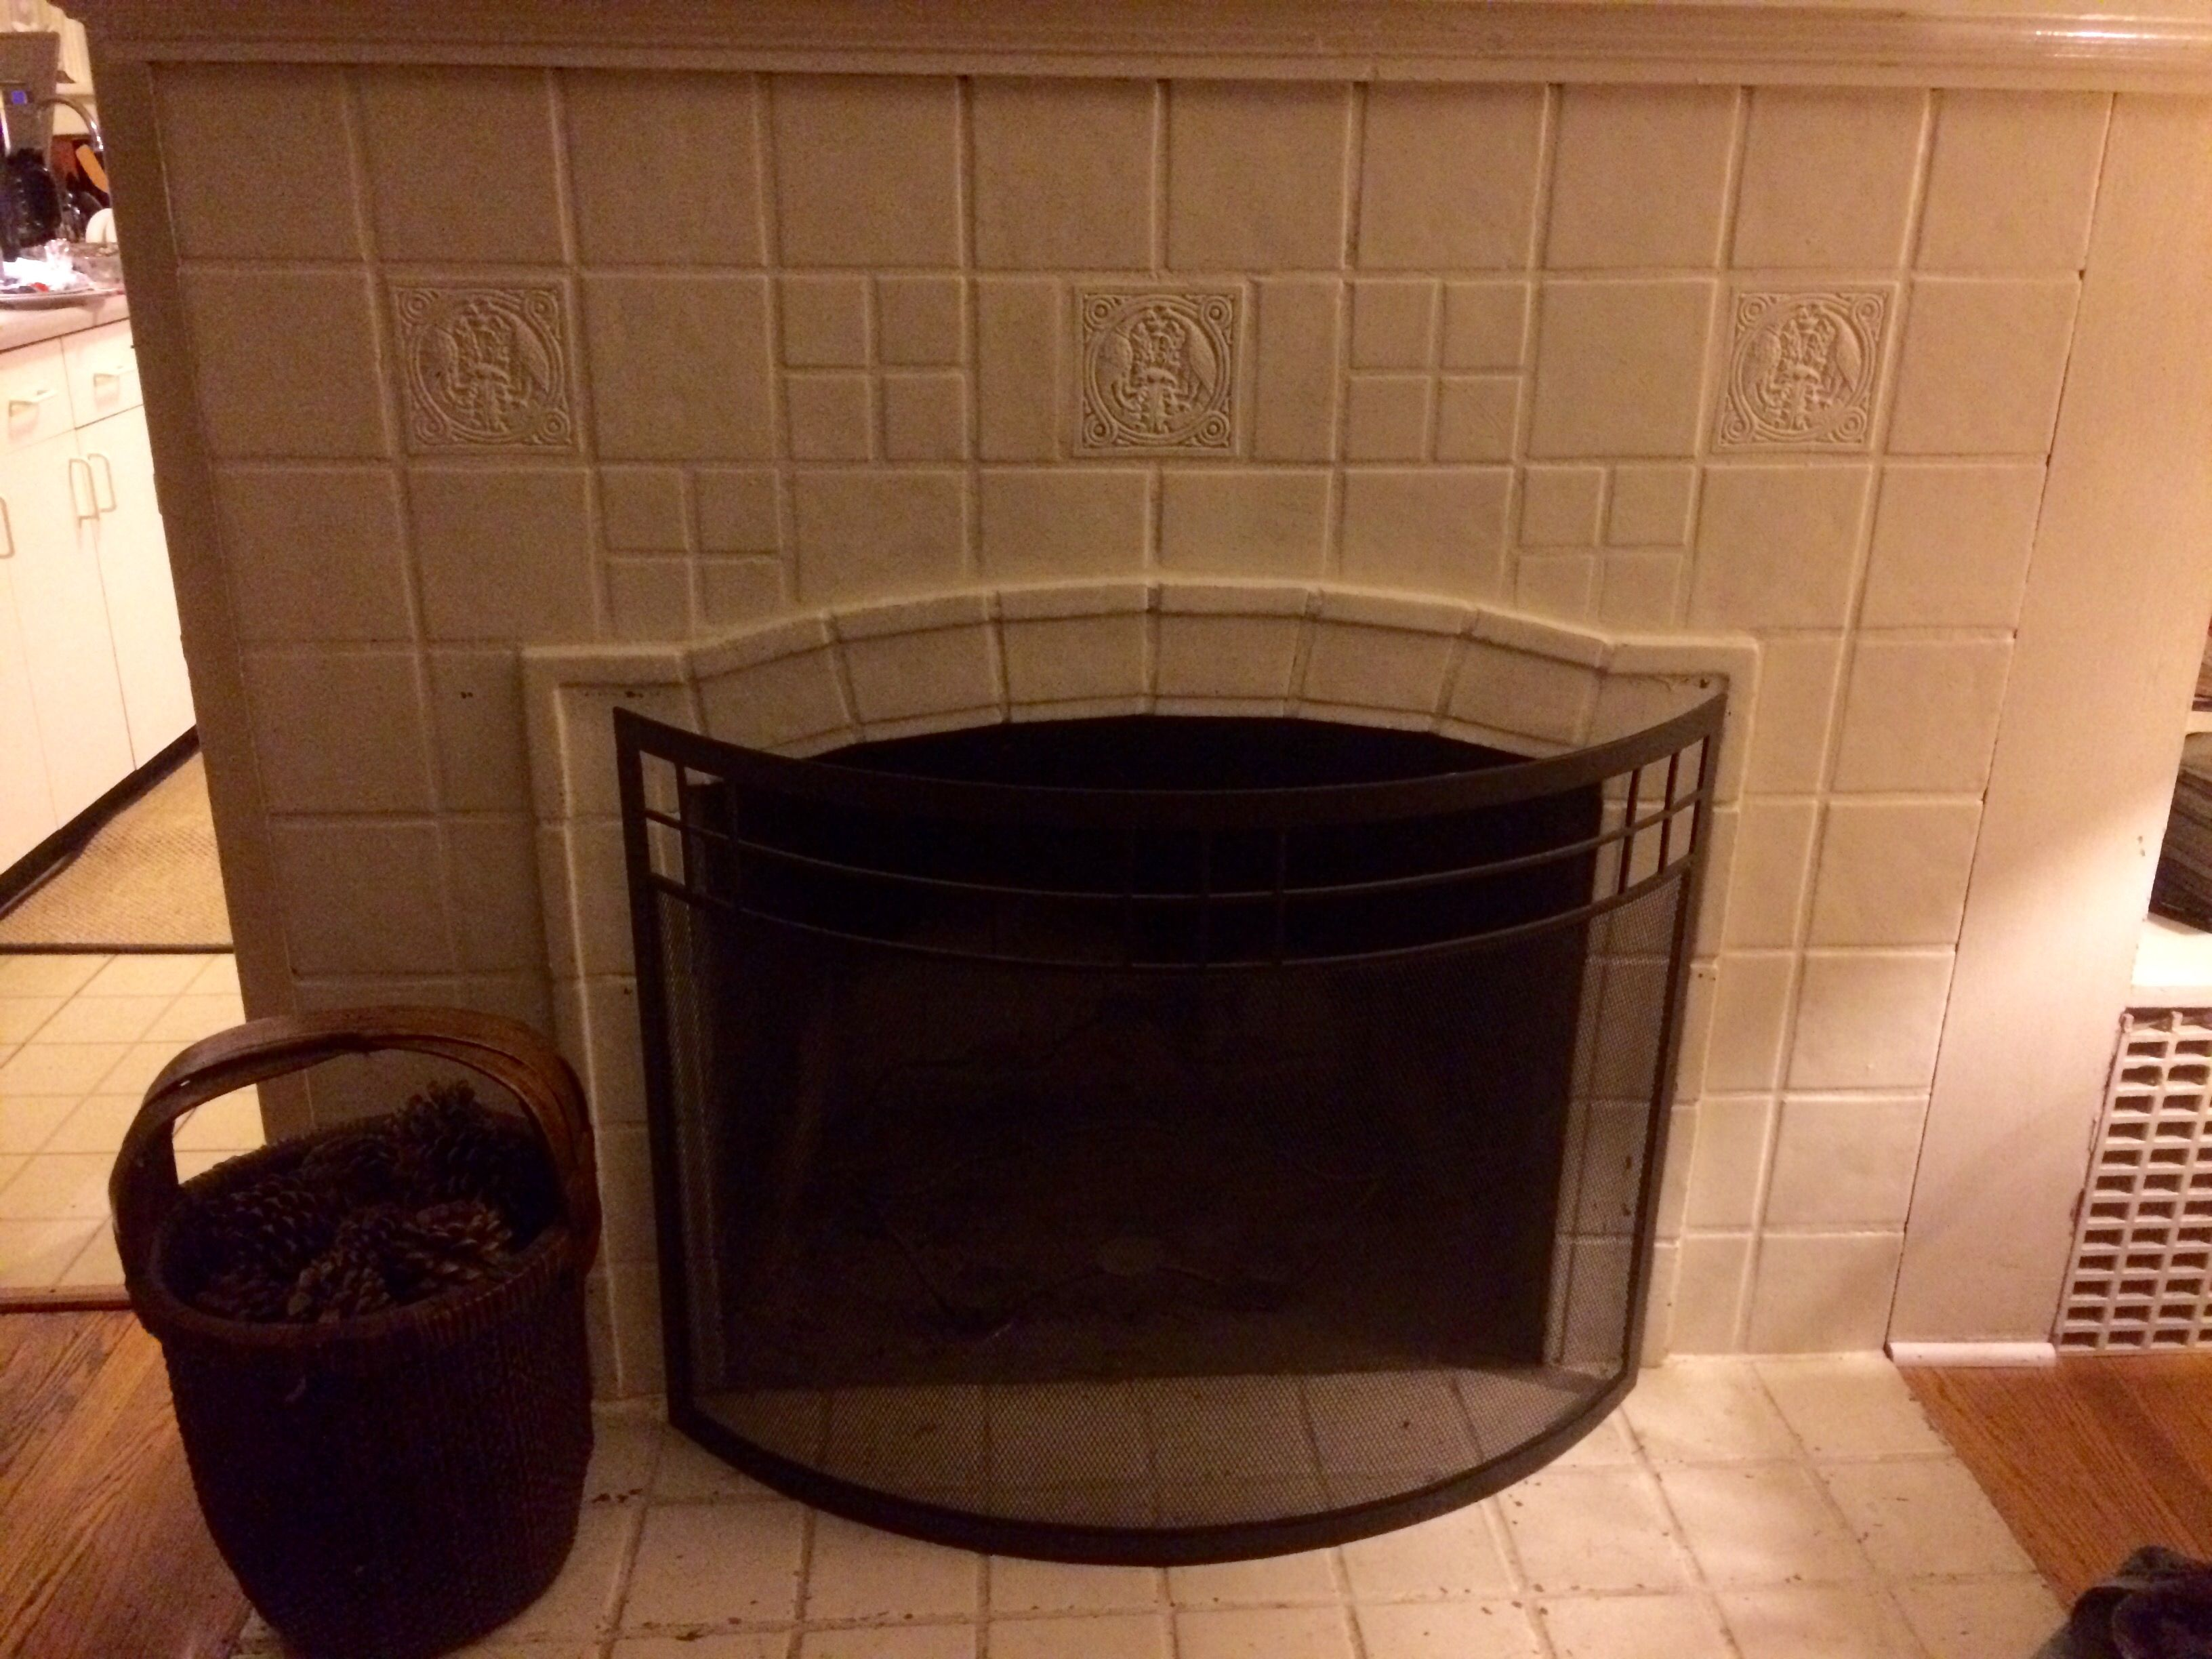 hamilton tile fireplace surround c 1928 in the seattle wa area